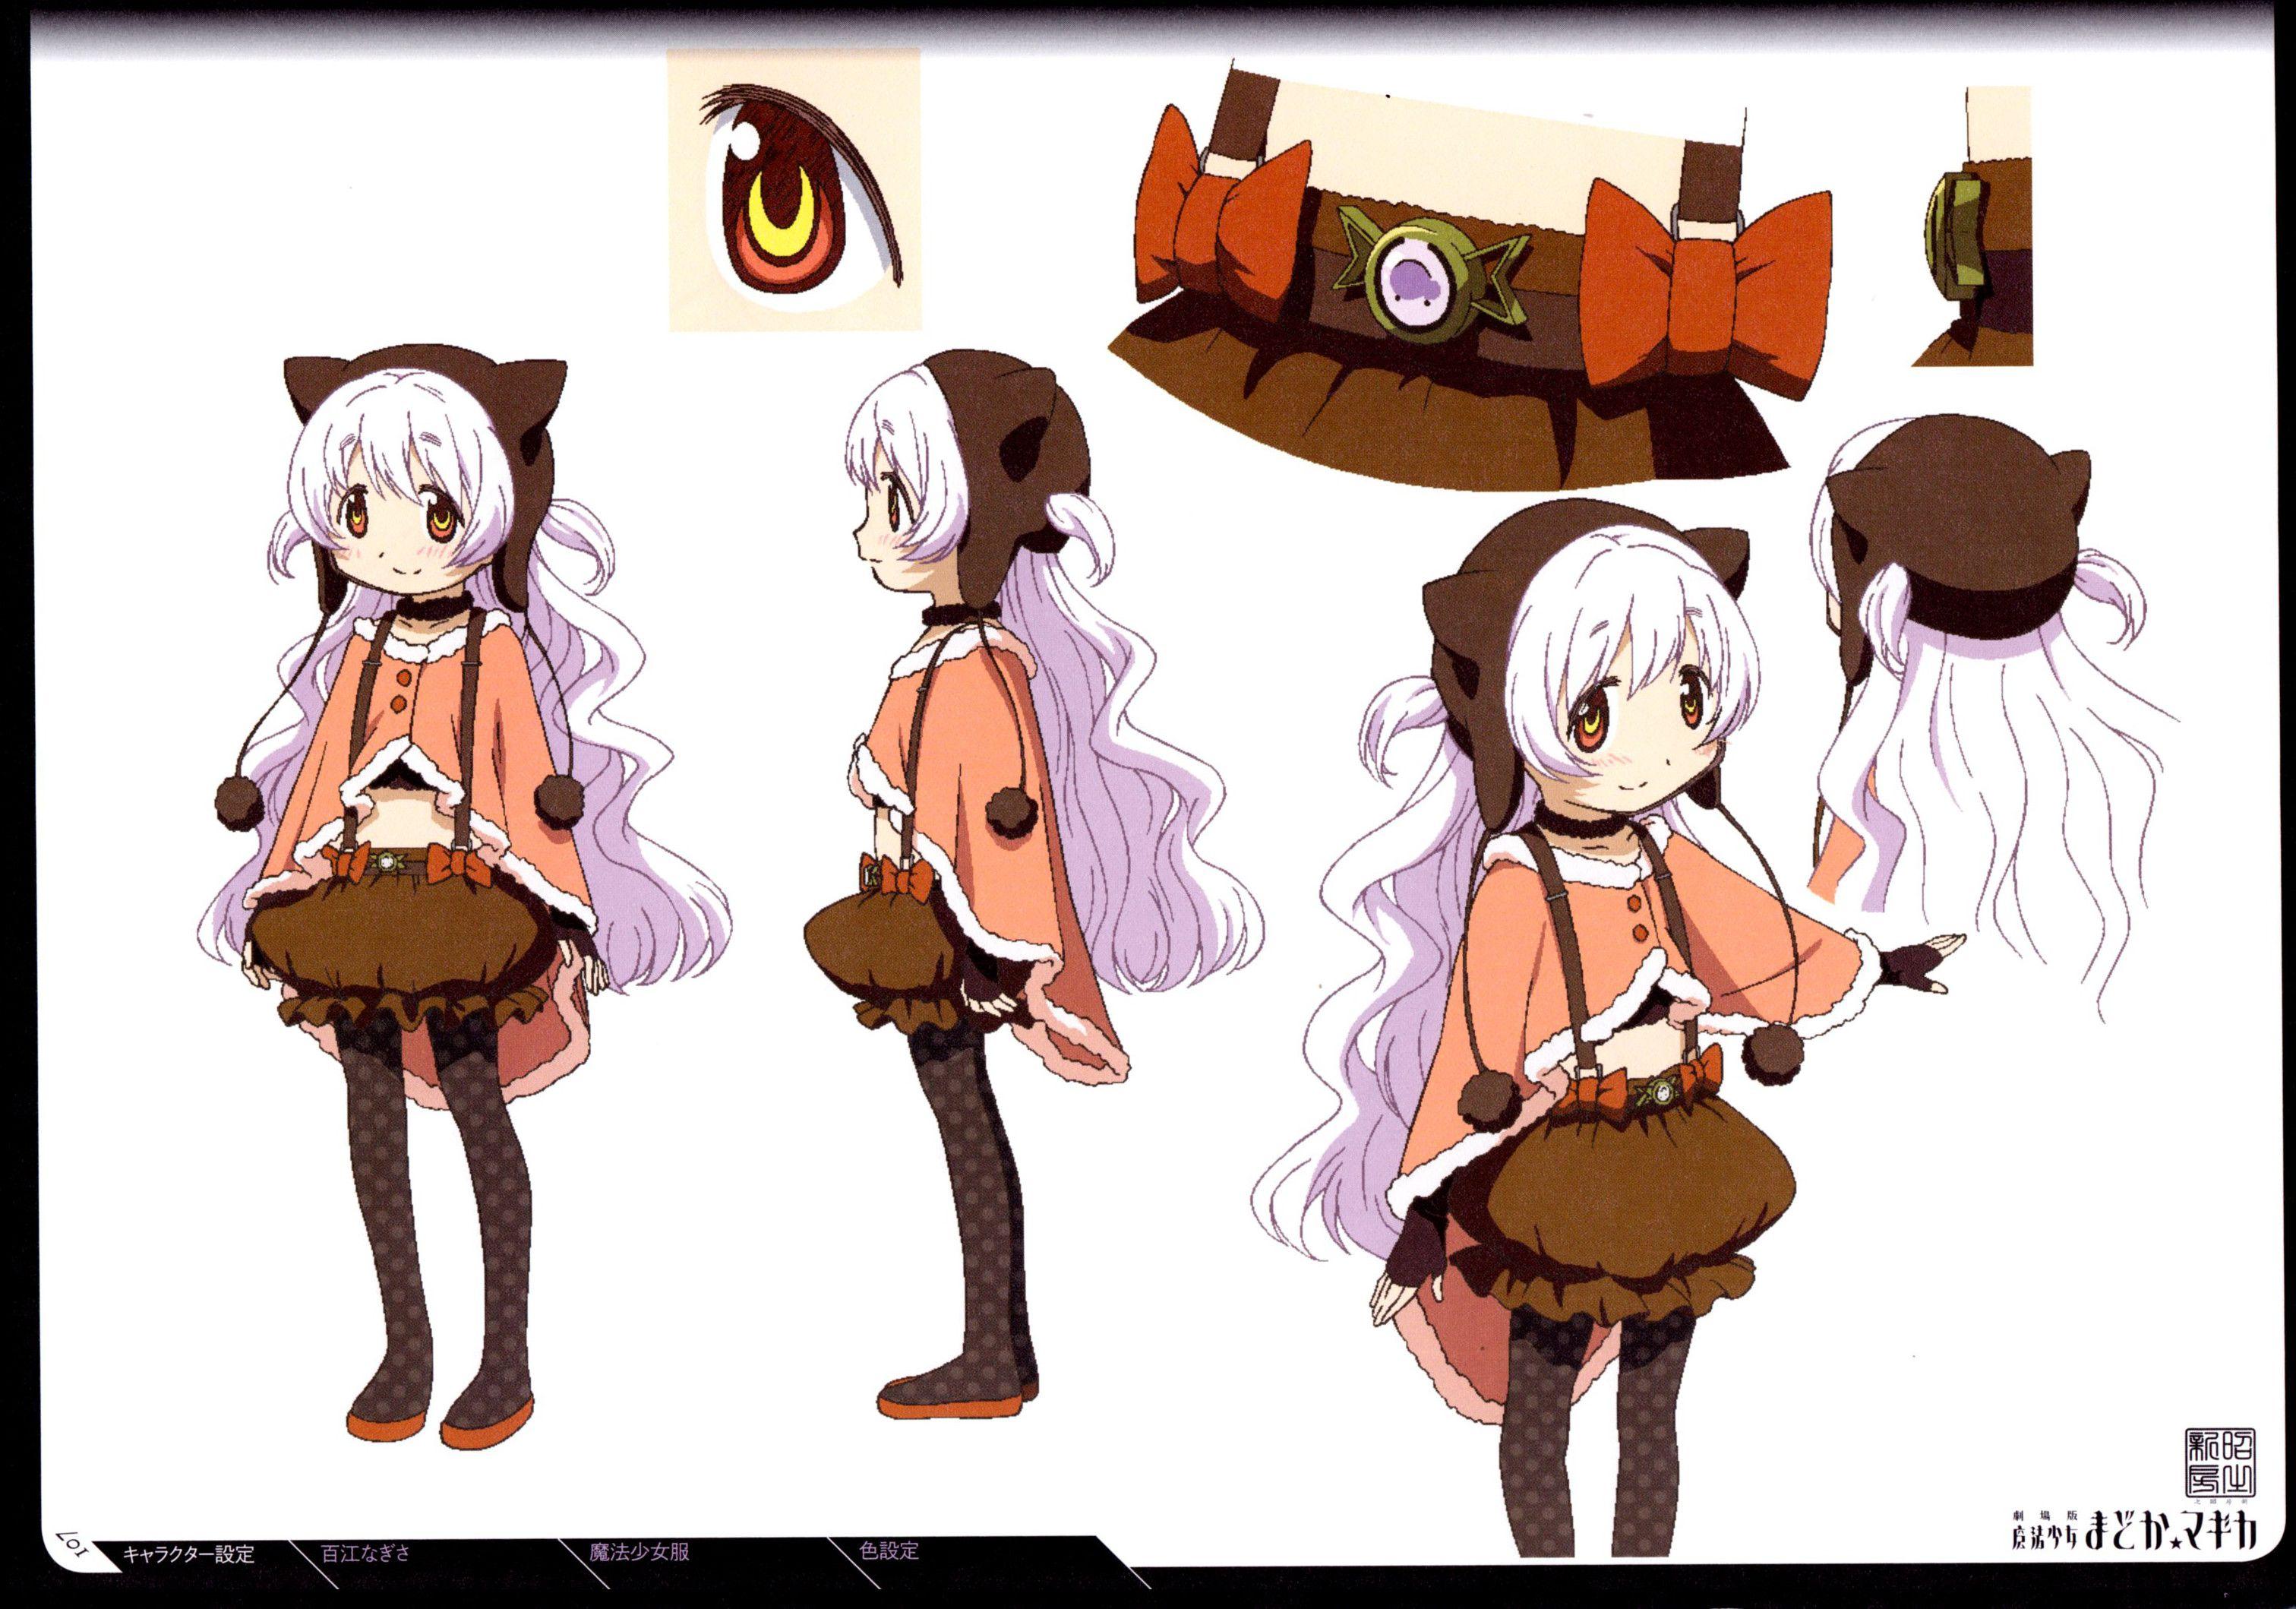 Shaft (Studio), Puella Magi Madoka Magica, Nagisa Momoe, Character ...